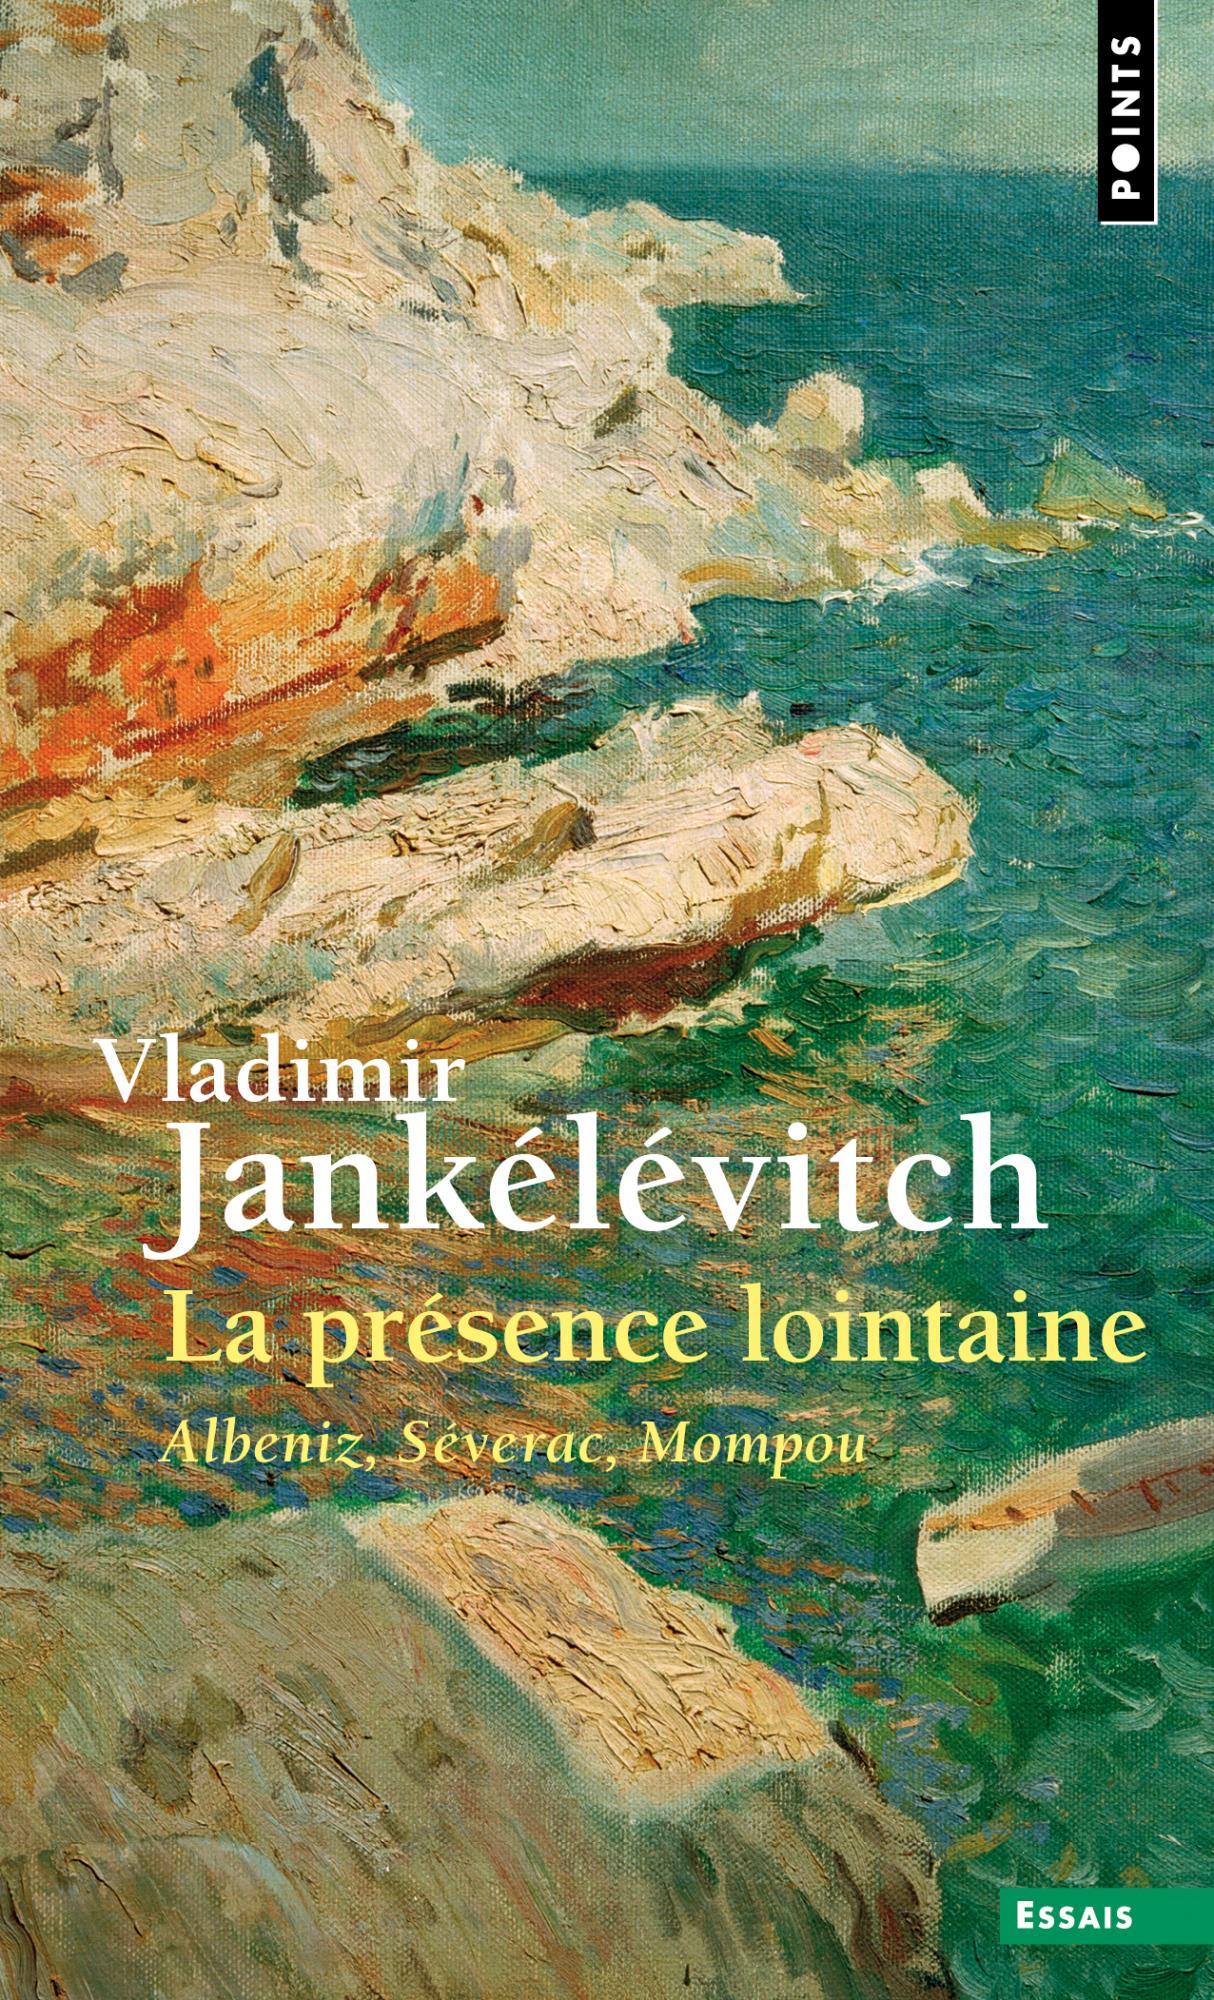 V. Jankélévic,La Présence lointaine.Albeniz, Séverac, Mompou